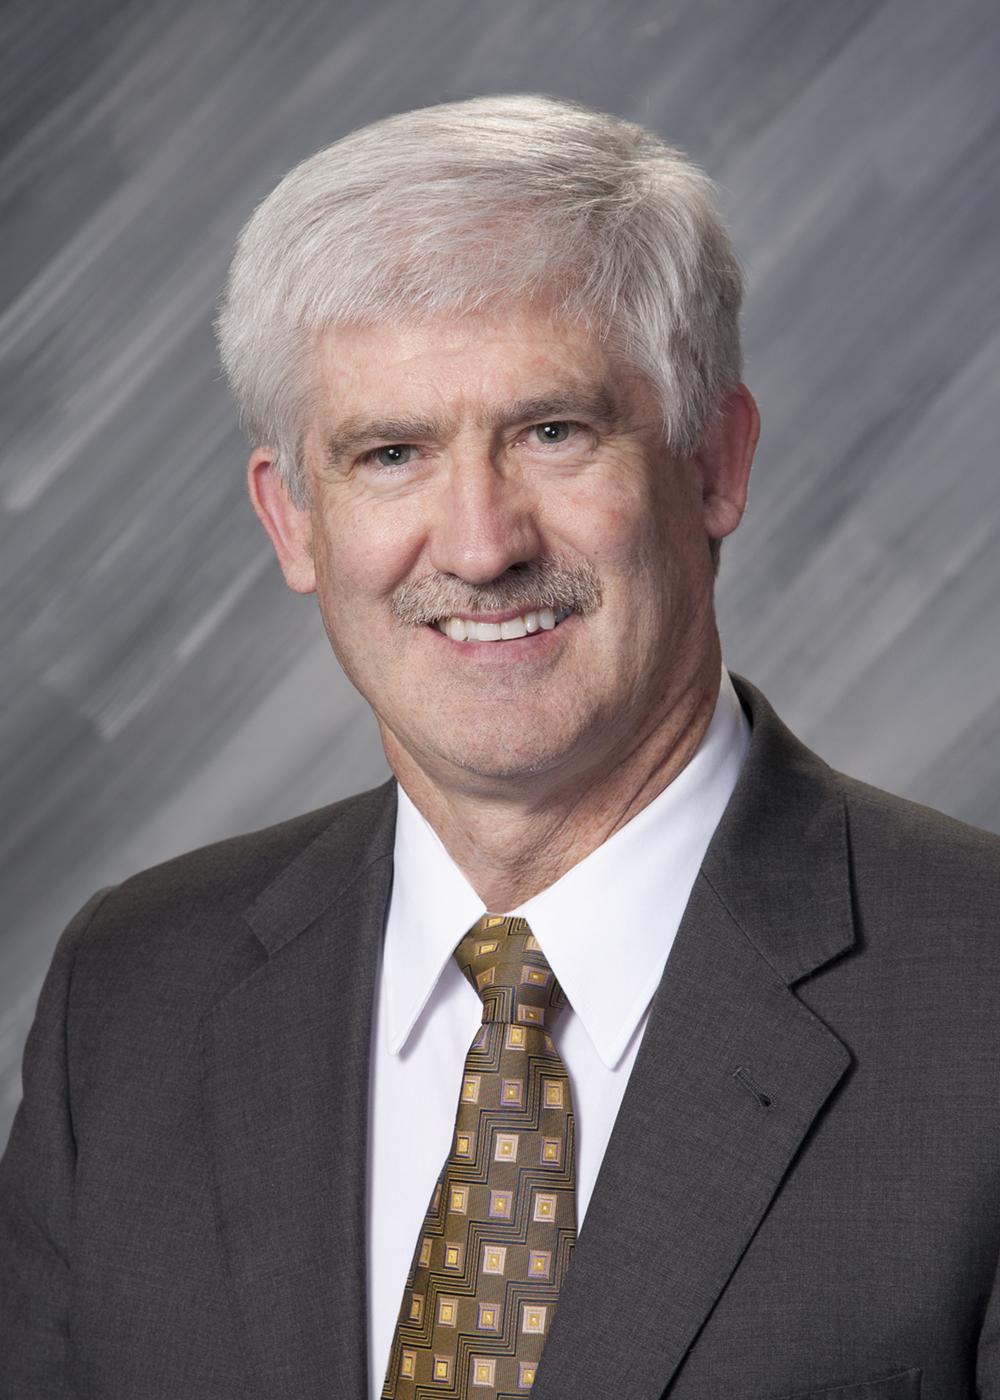 Mayor of Morganton Ronnie Thompson